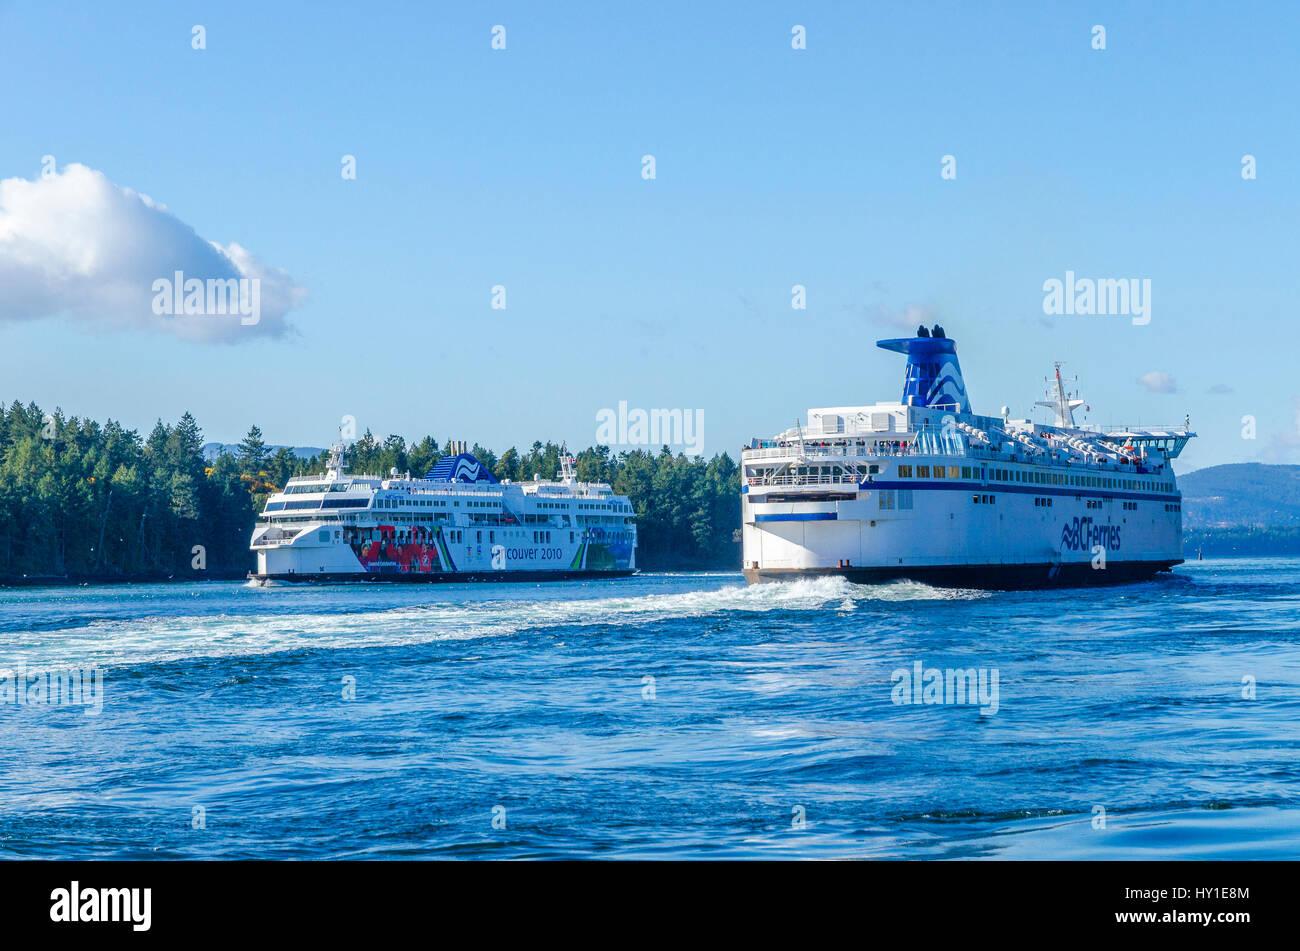 Bc Ferries in Active Pass near Galiano Island, British Columbia, Canada - Stock Image